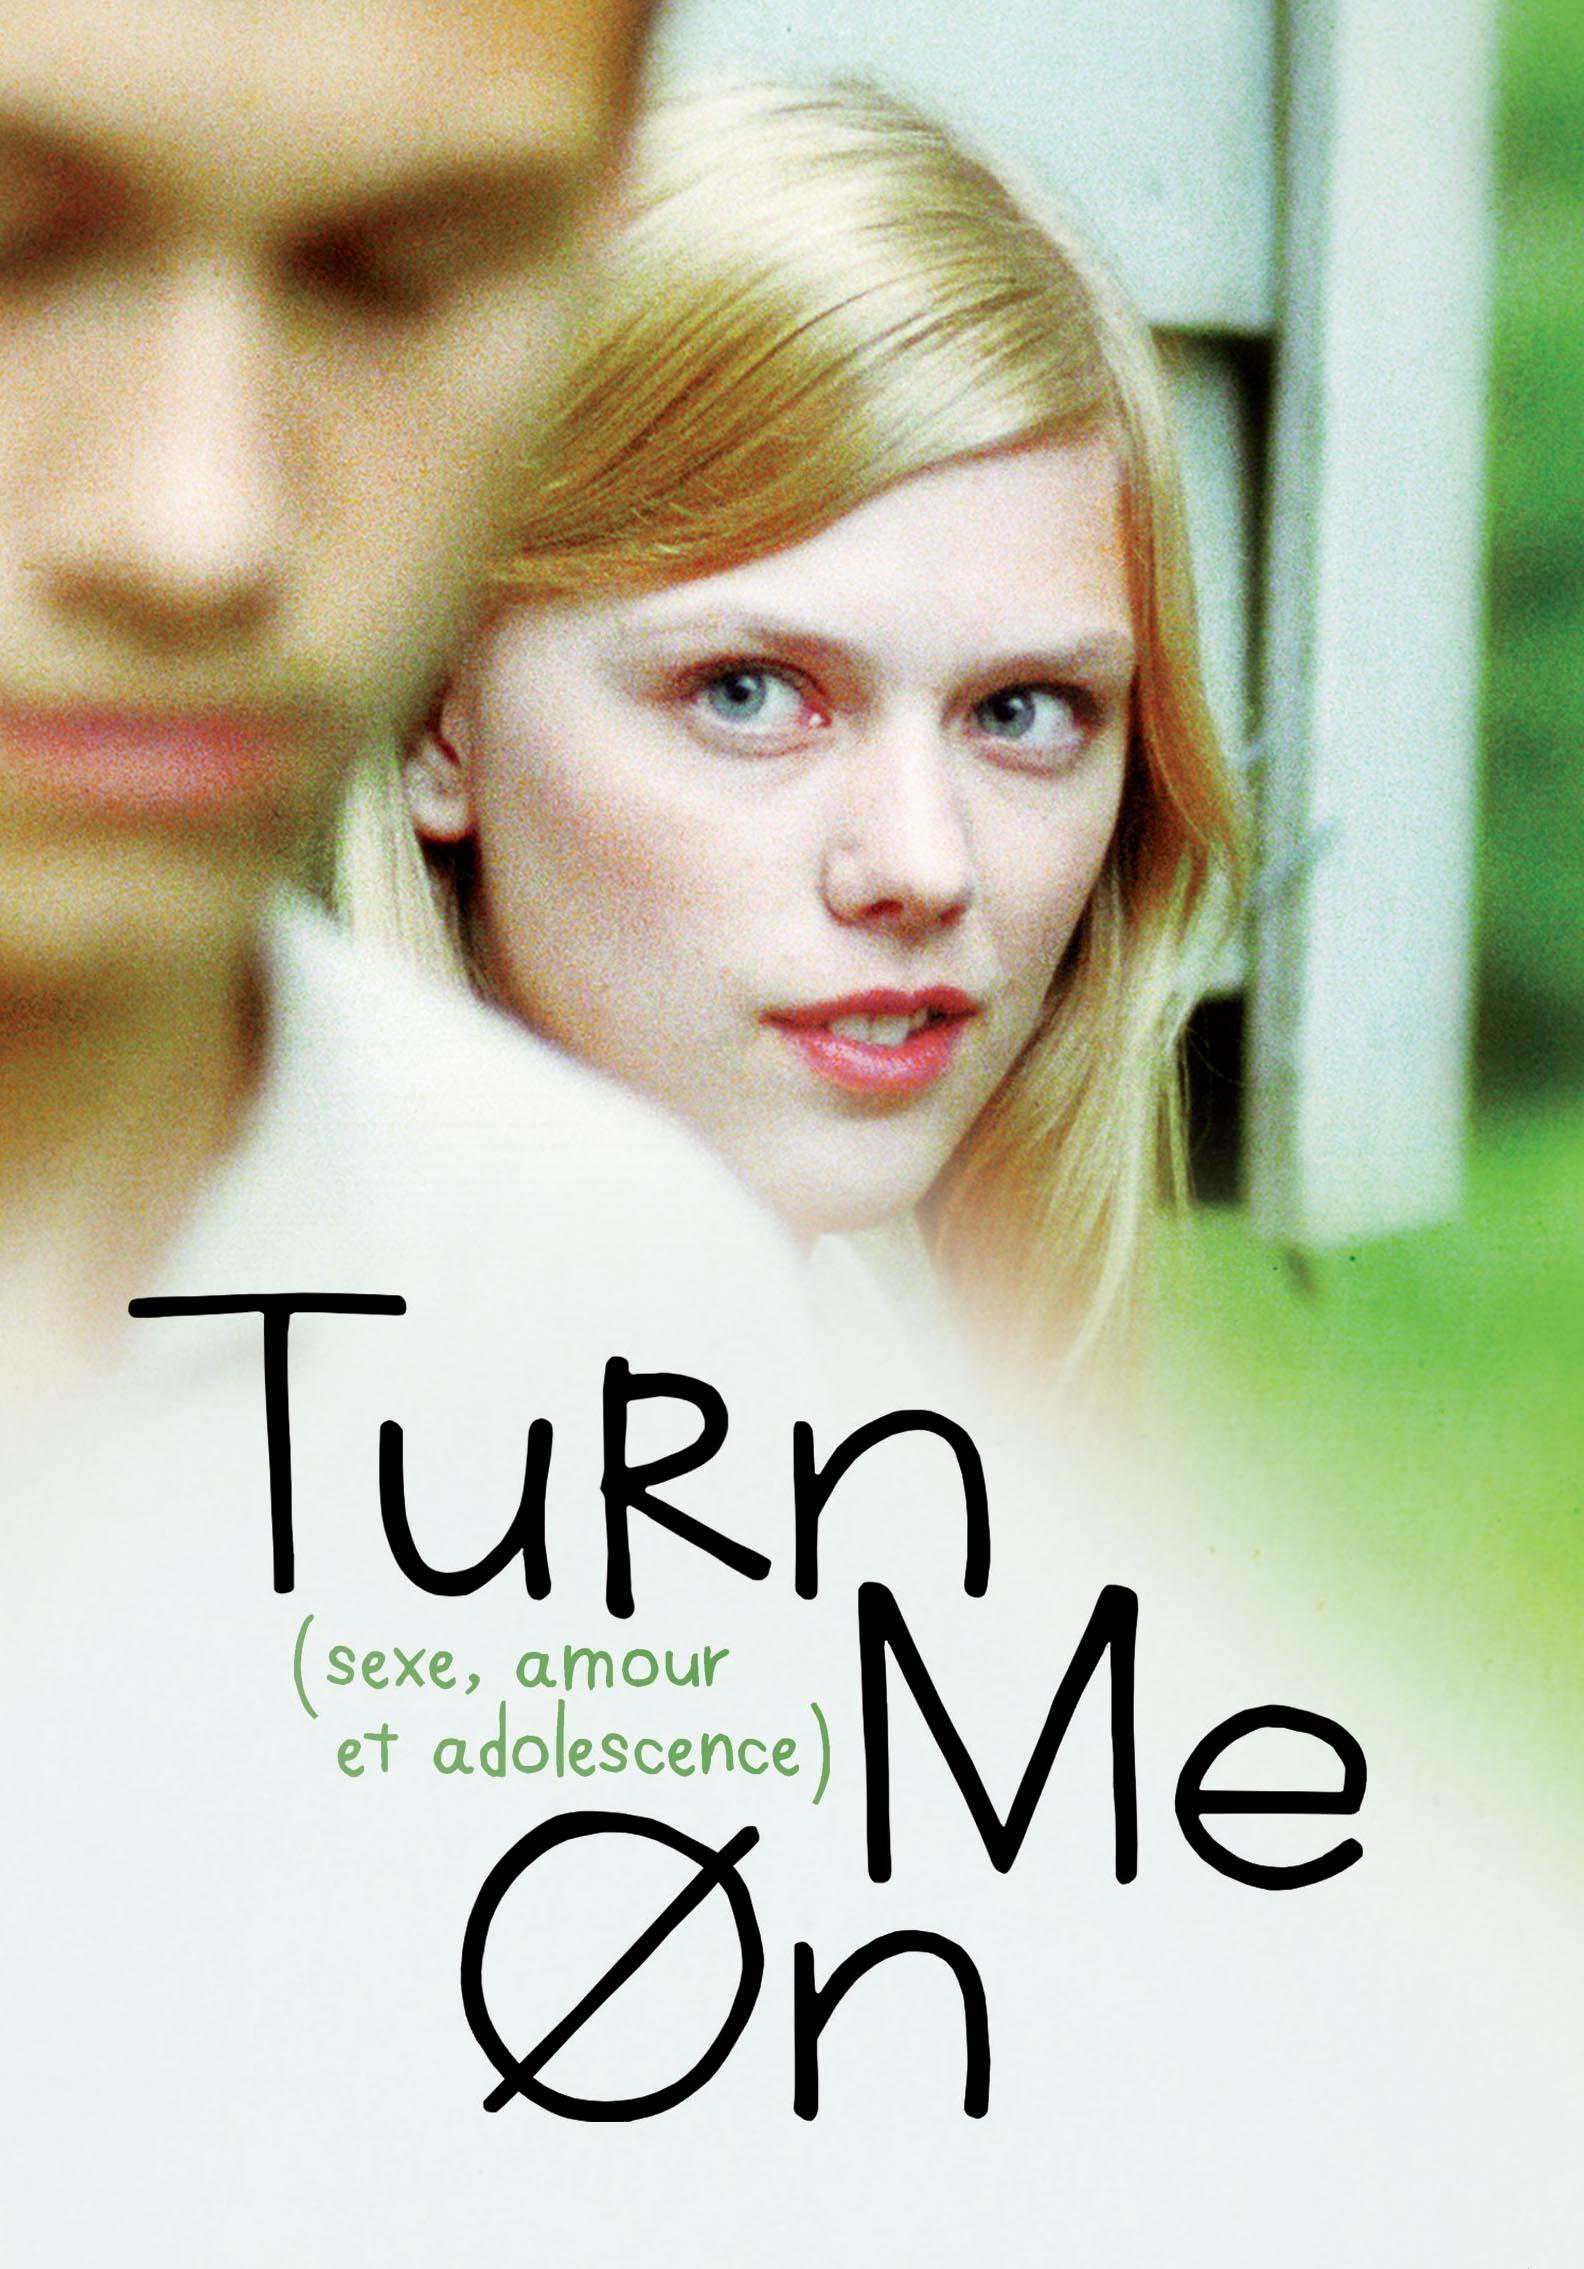 Turn me on - dvd